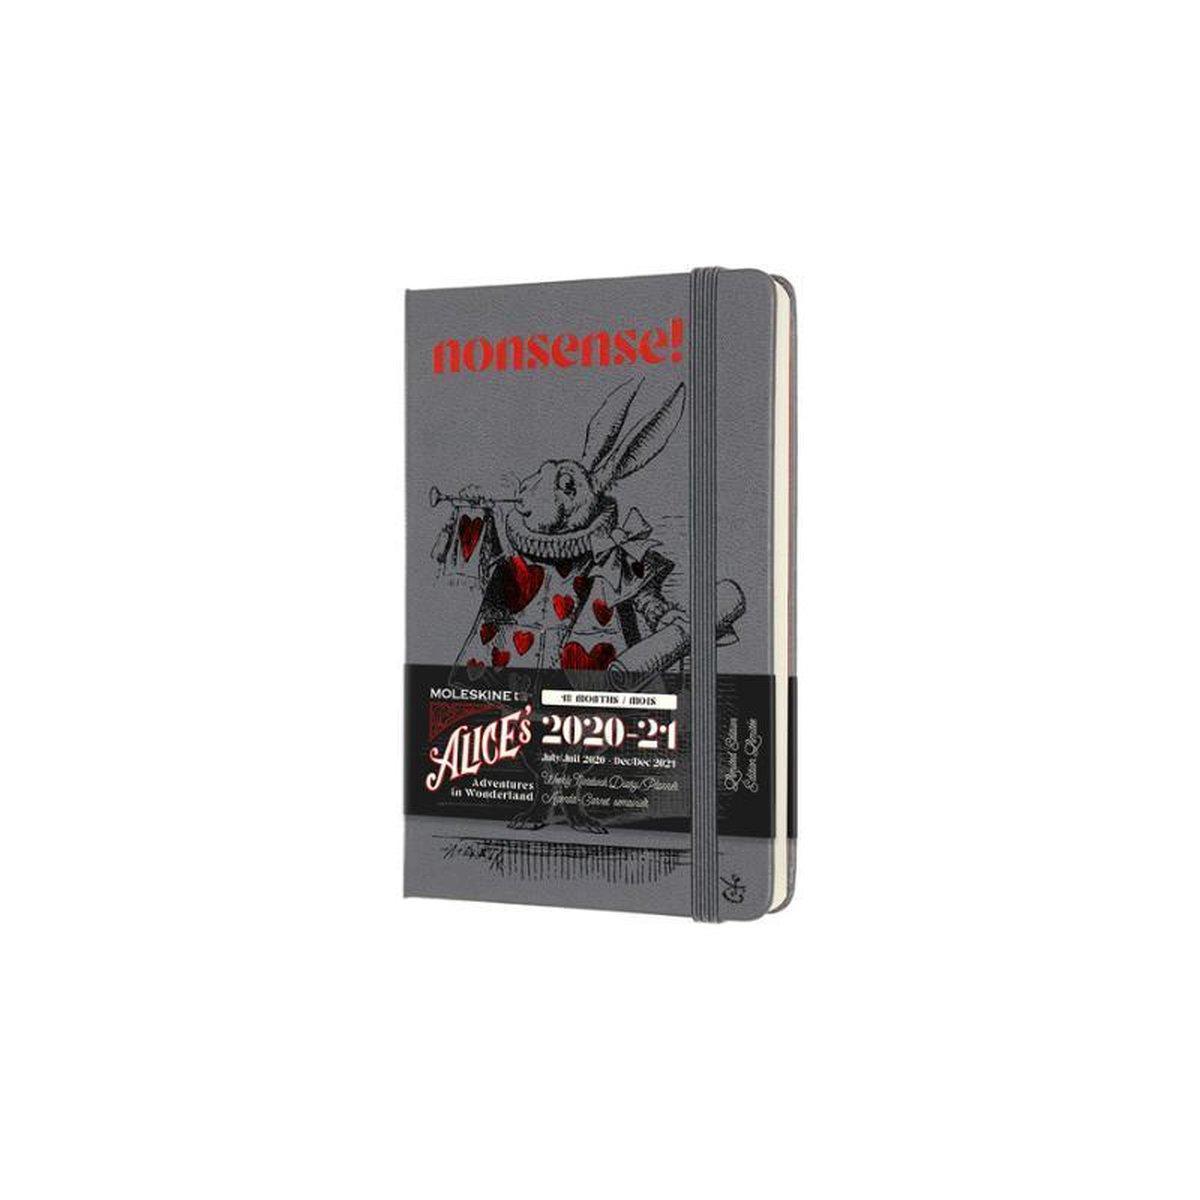 Moleskine 18 Maanden Agenda - 2020/21 - Limited Edition Planner - Alice In Wonderland - Wekelijks - Pocket (9x14 cm) - Paars - Harde Kaft